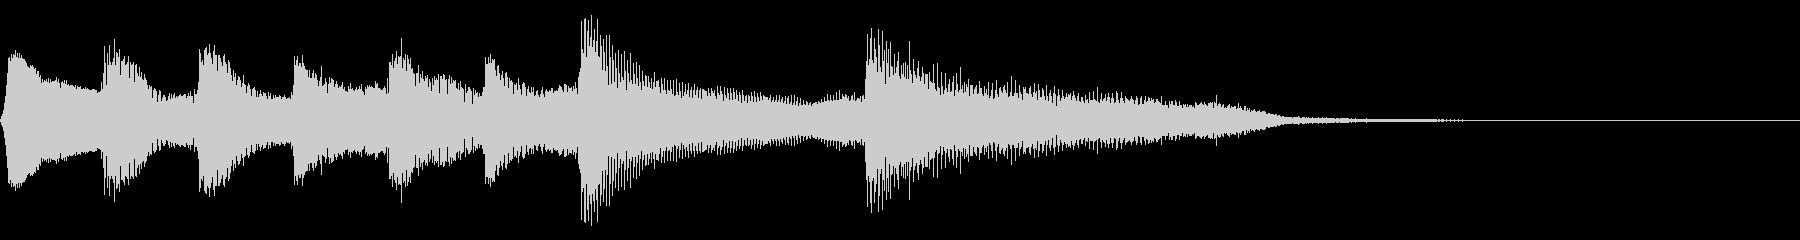 8bit レトロなゲームクリア音 達成の未再生の波形